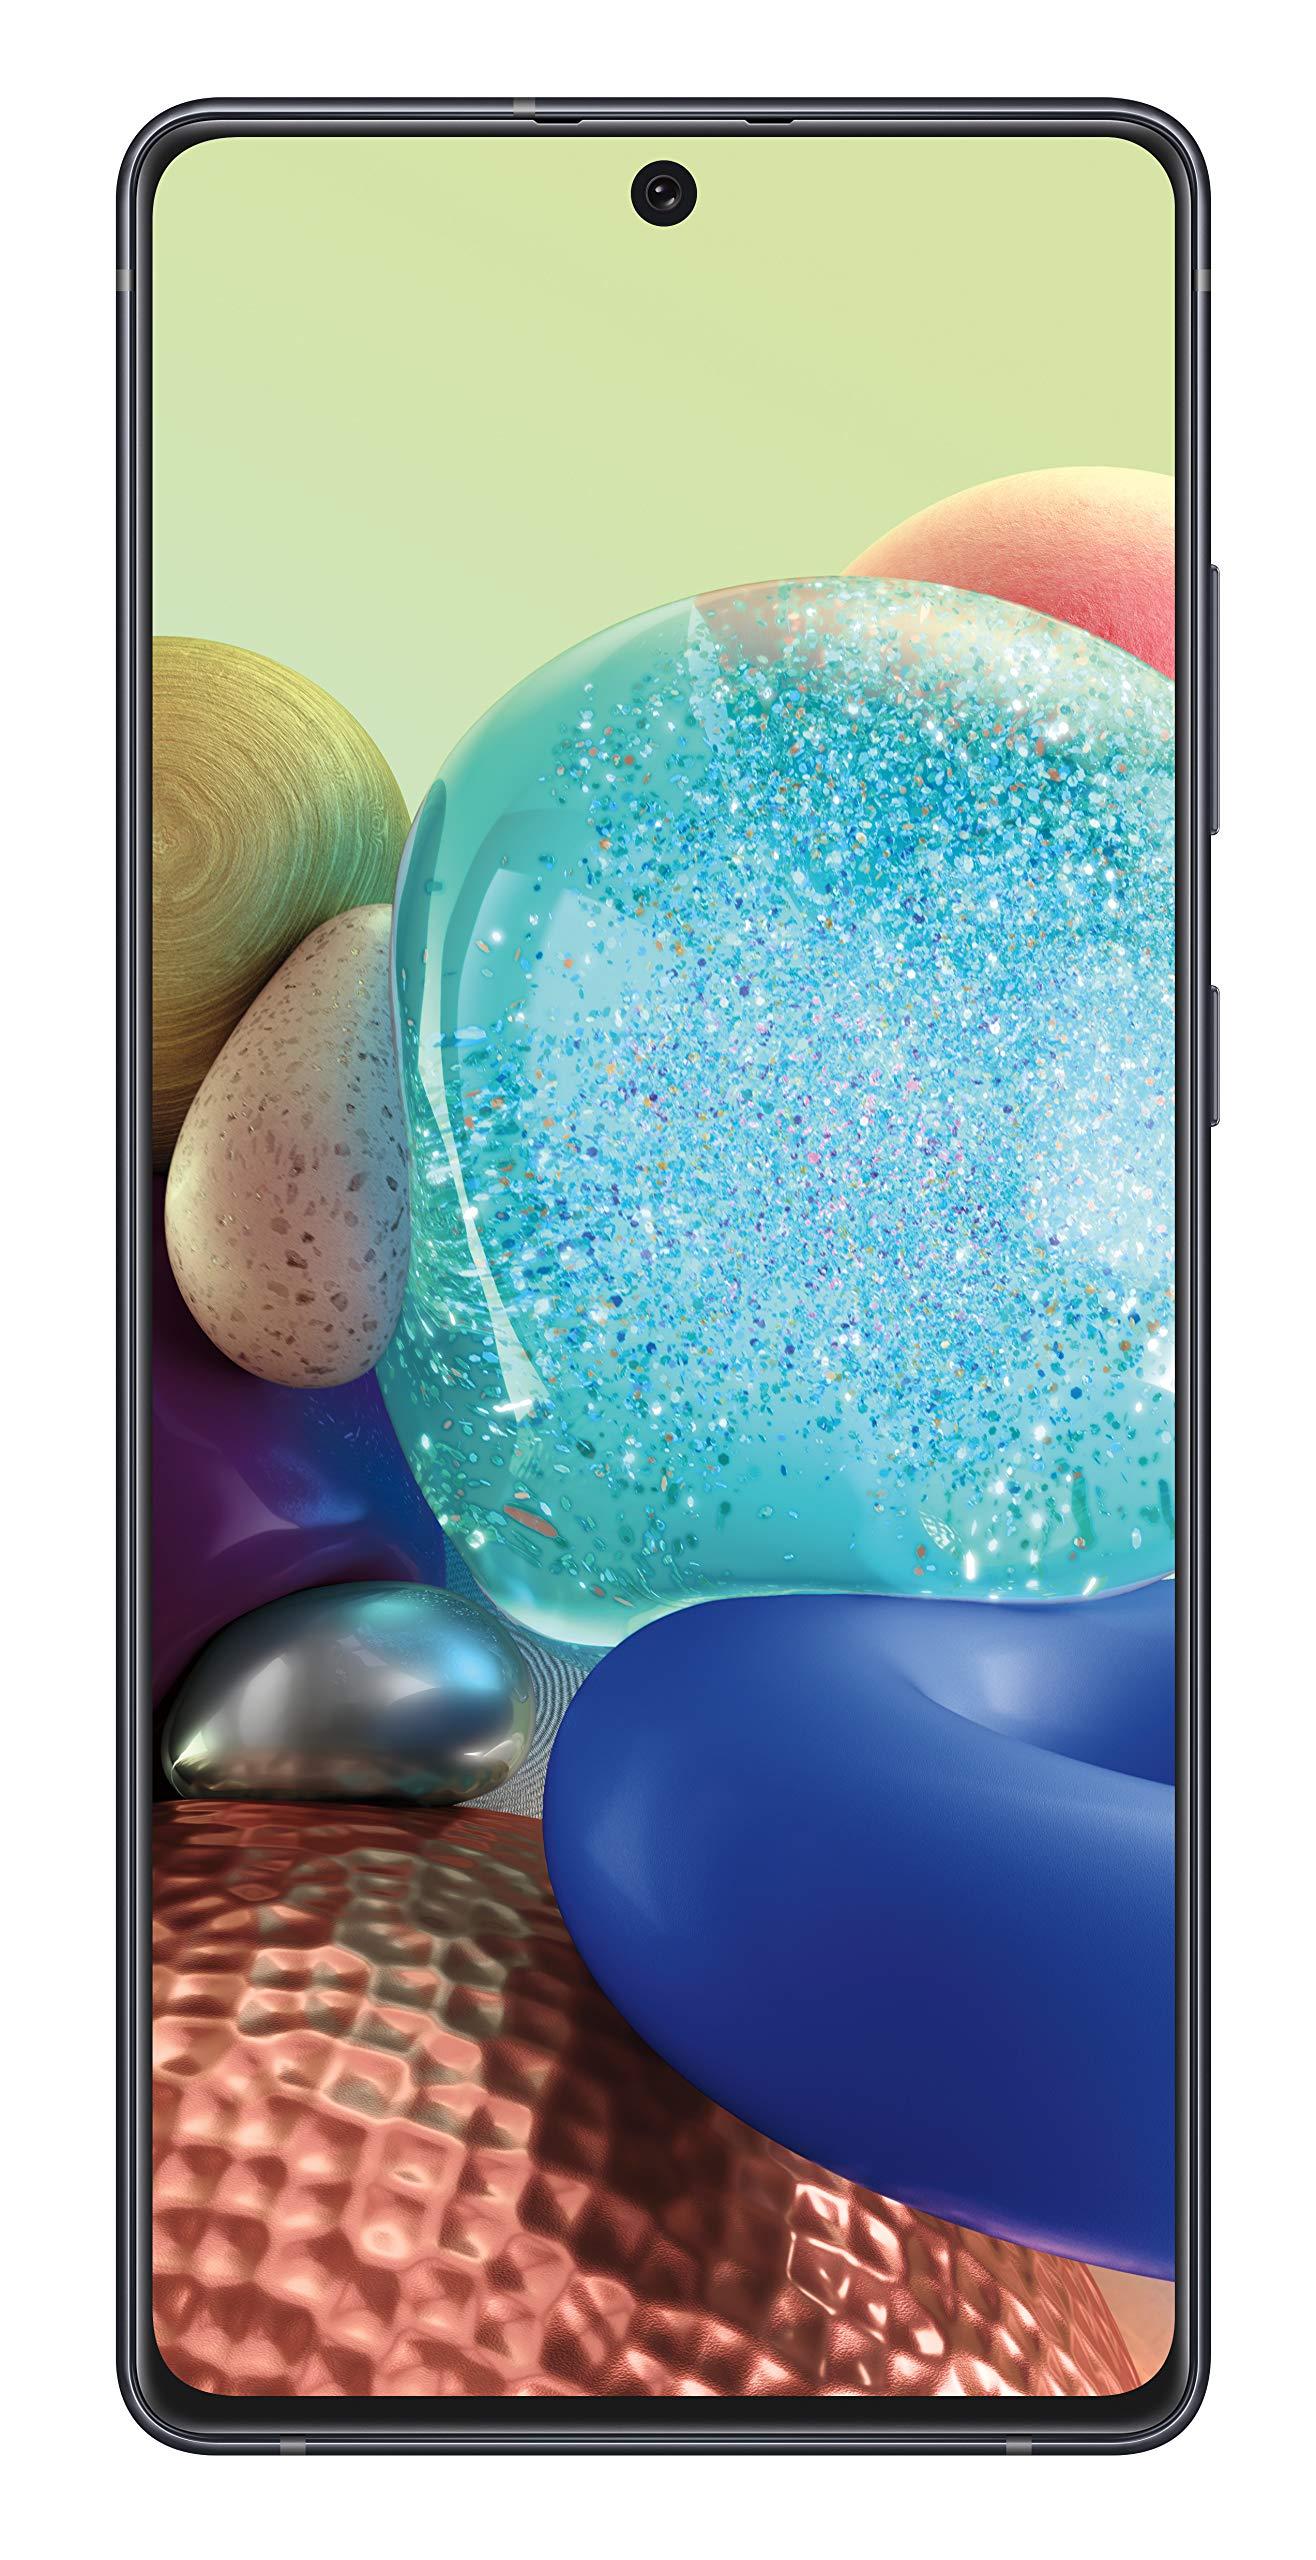 "Samsung Galaxy A71 5G Unlocked , 6.7"" AMOLED Screen,128GB of Storage, Long Lasting Battery, Single SIM, 2020 Model, US Ver..."